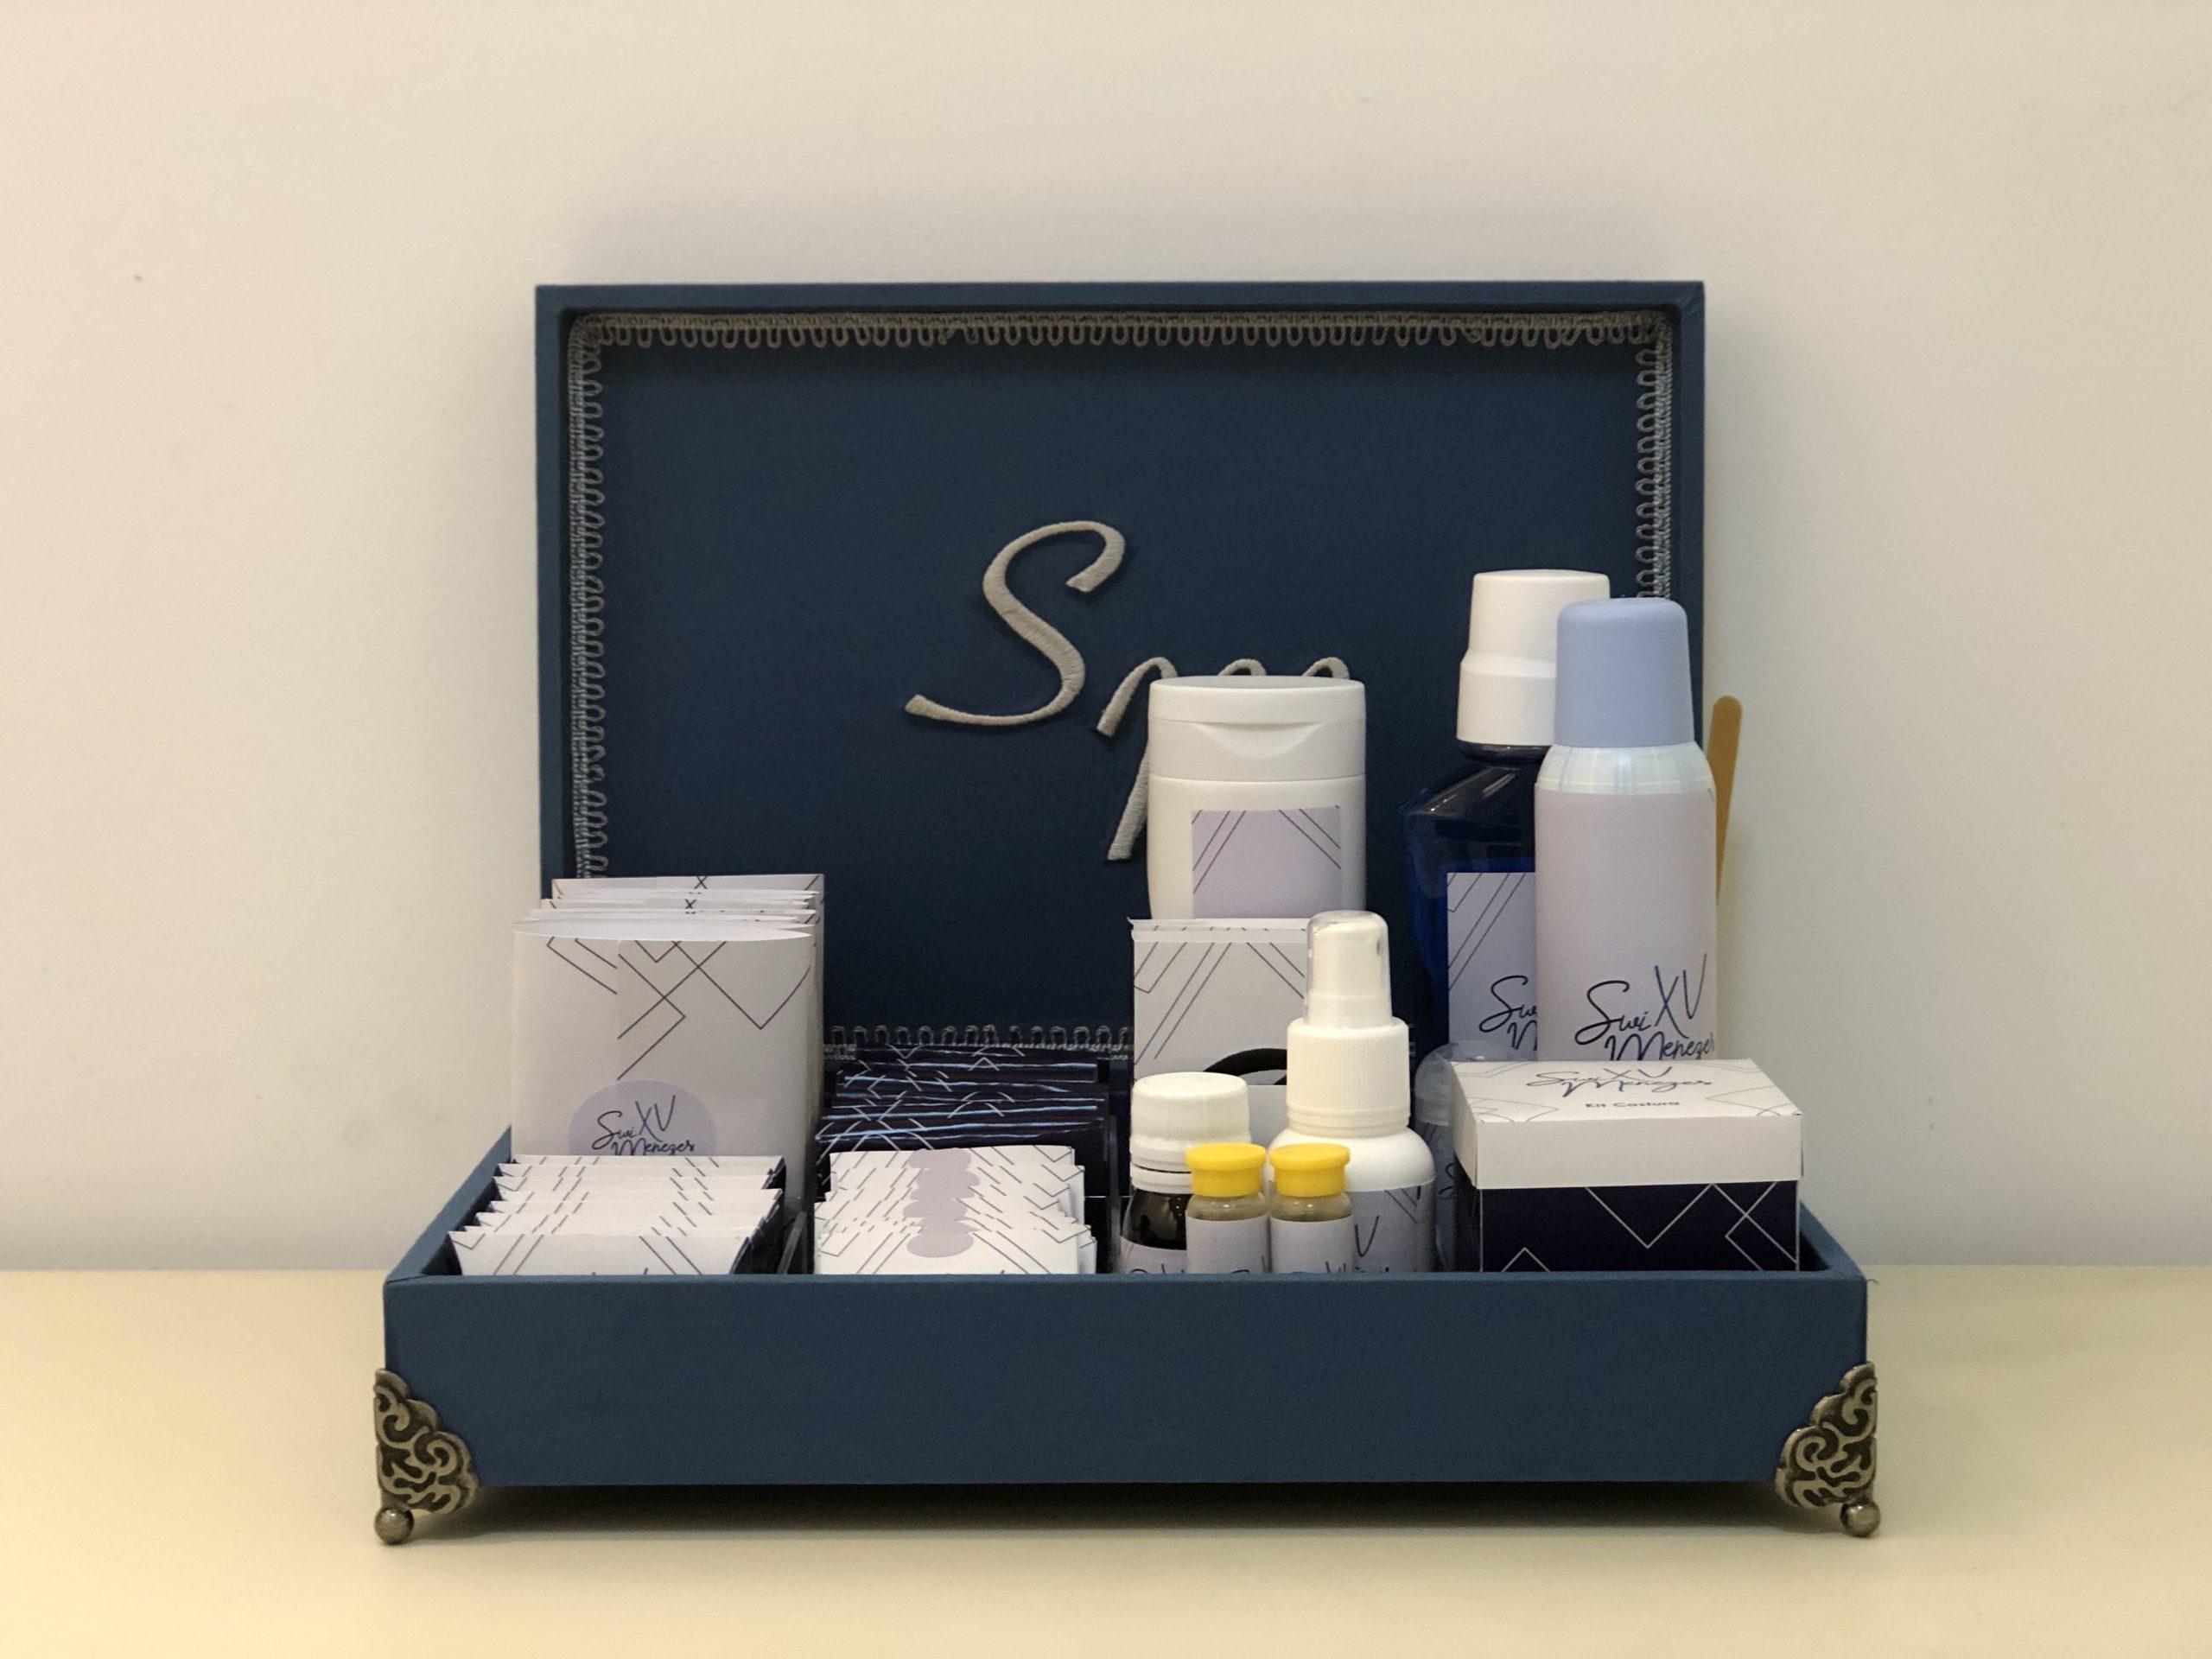 Kit Toalete de Swi -